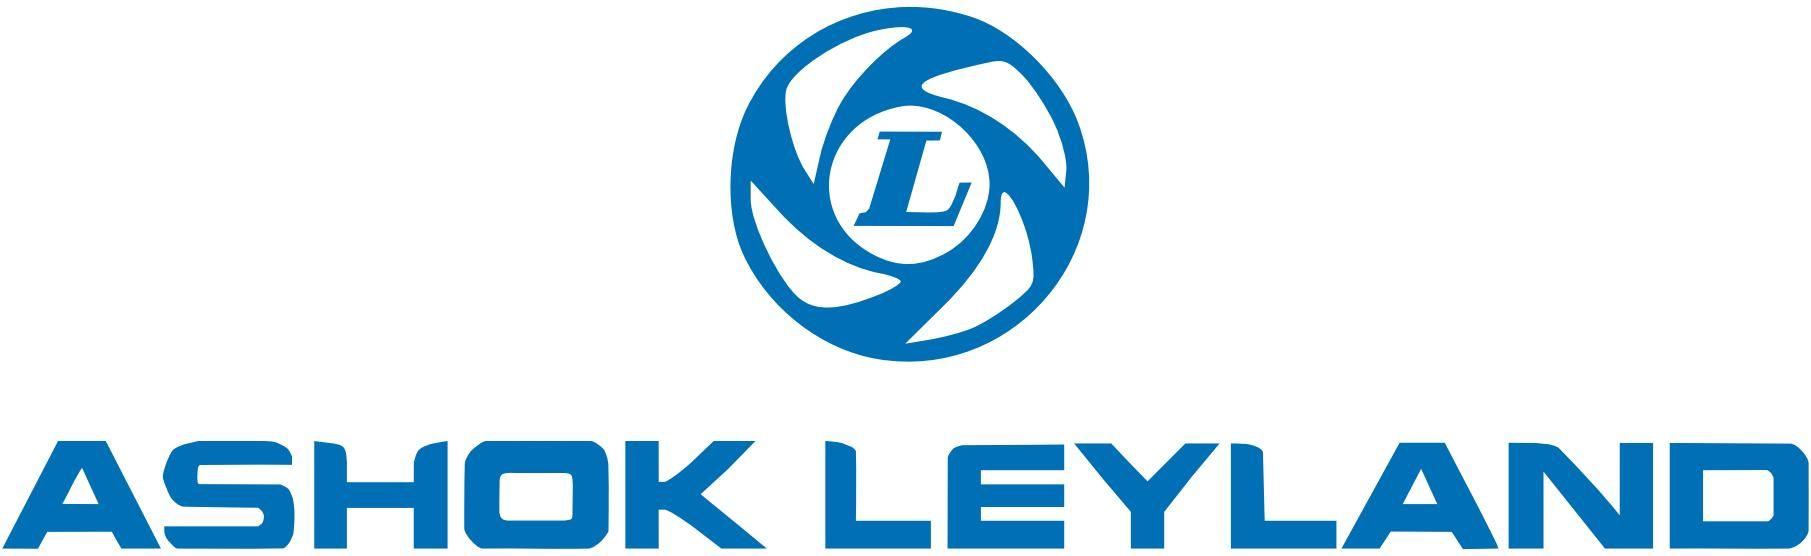 ashok leyland logo epspdf car and motorcycle logos